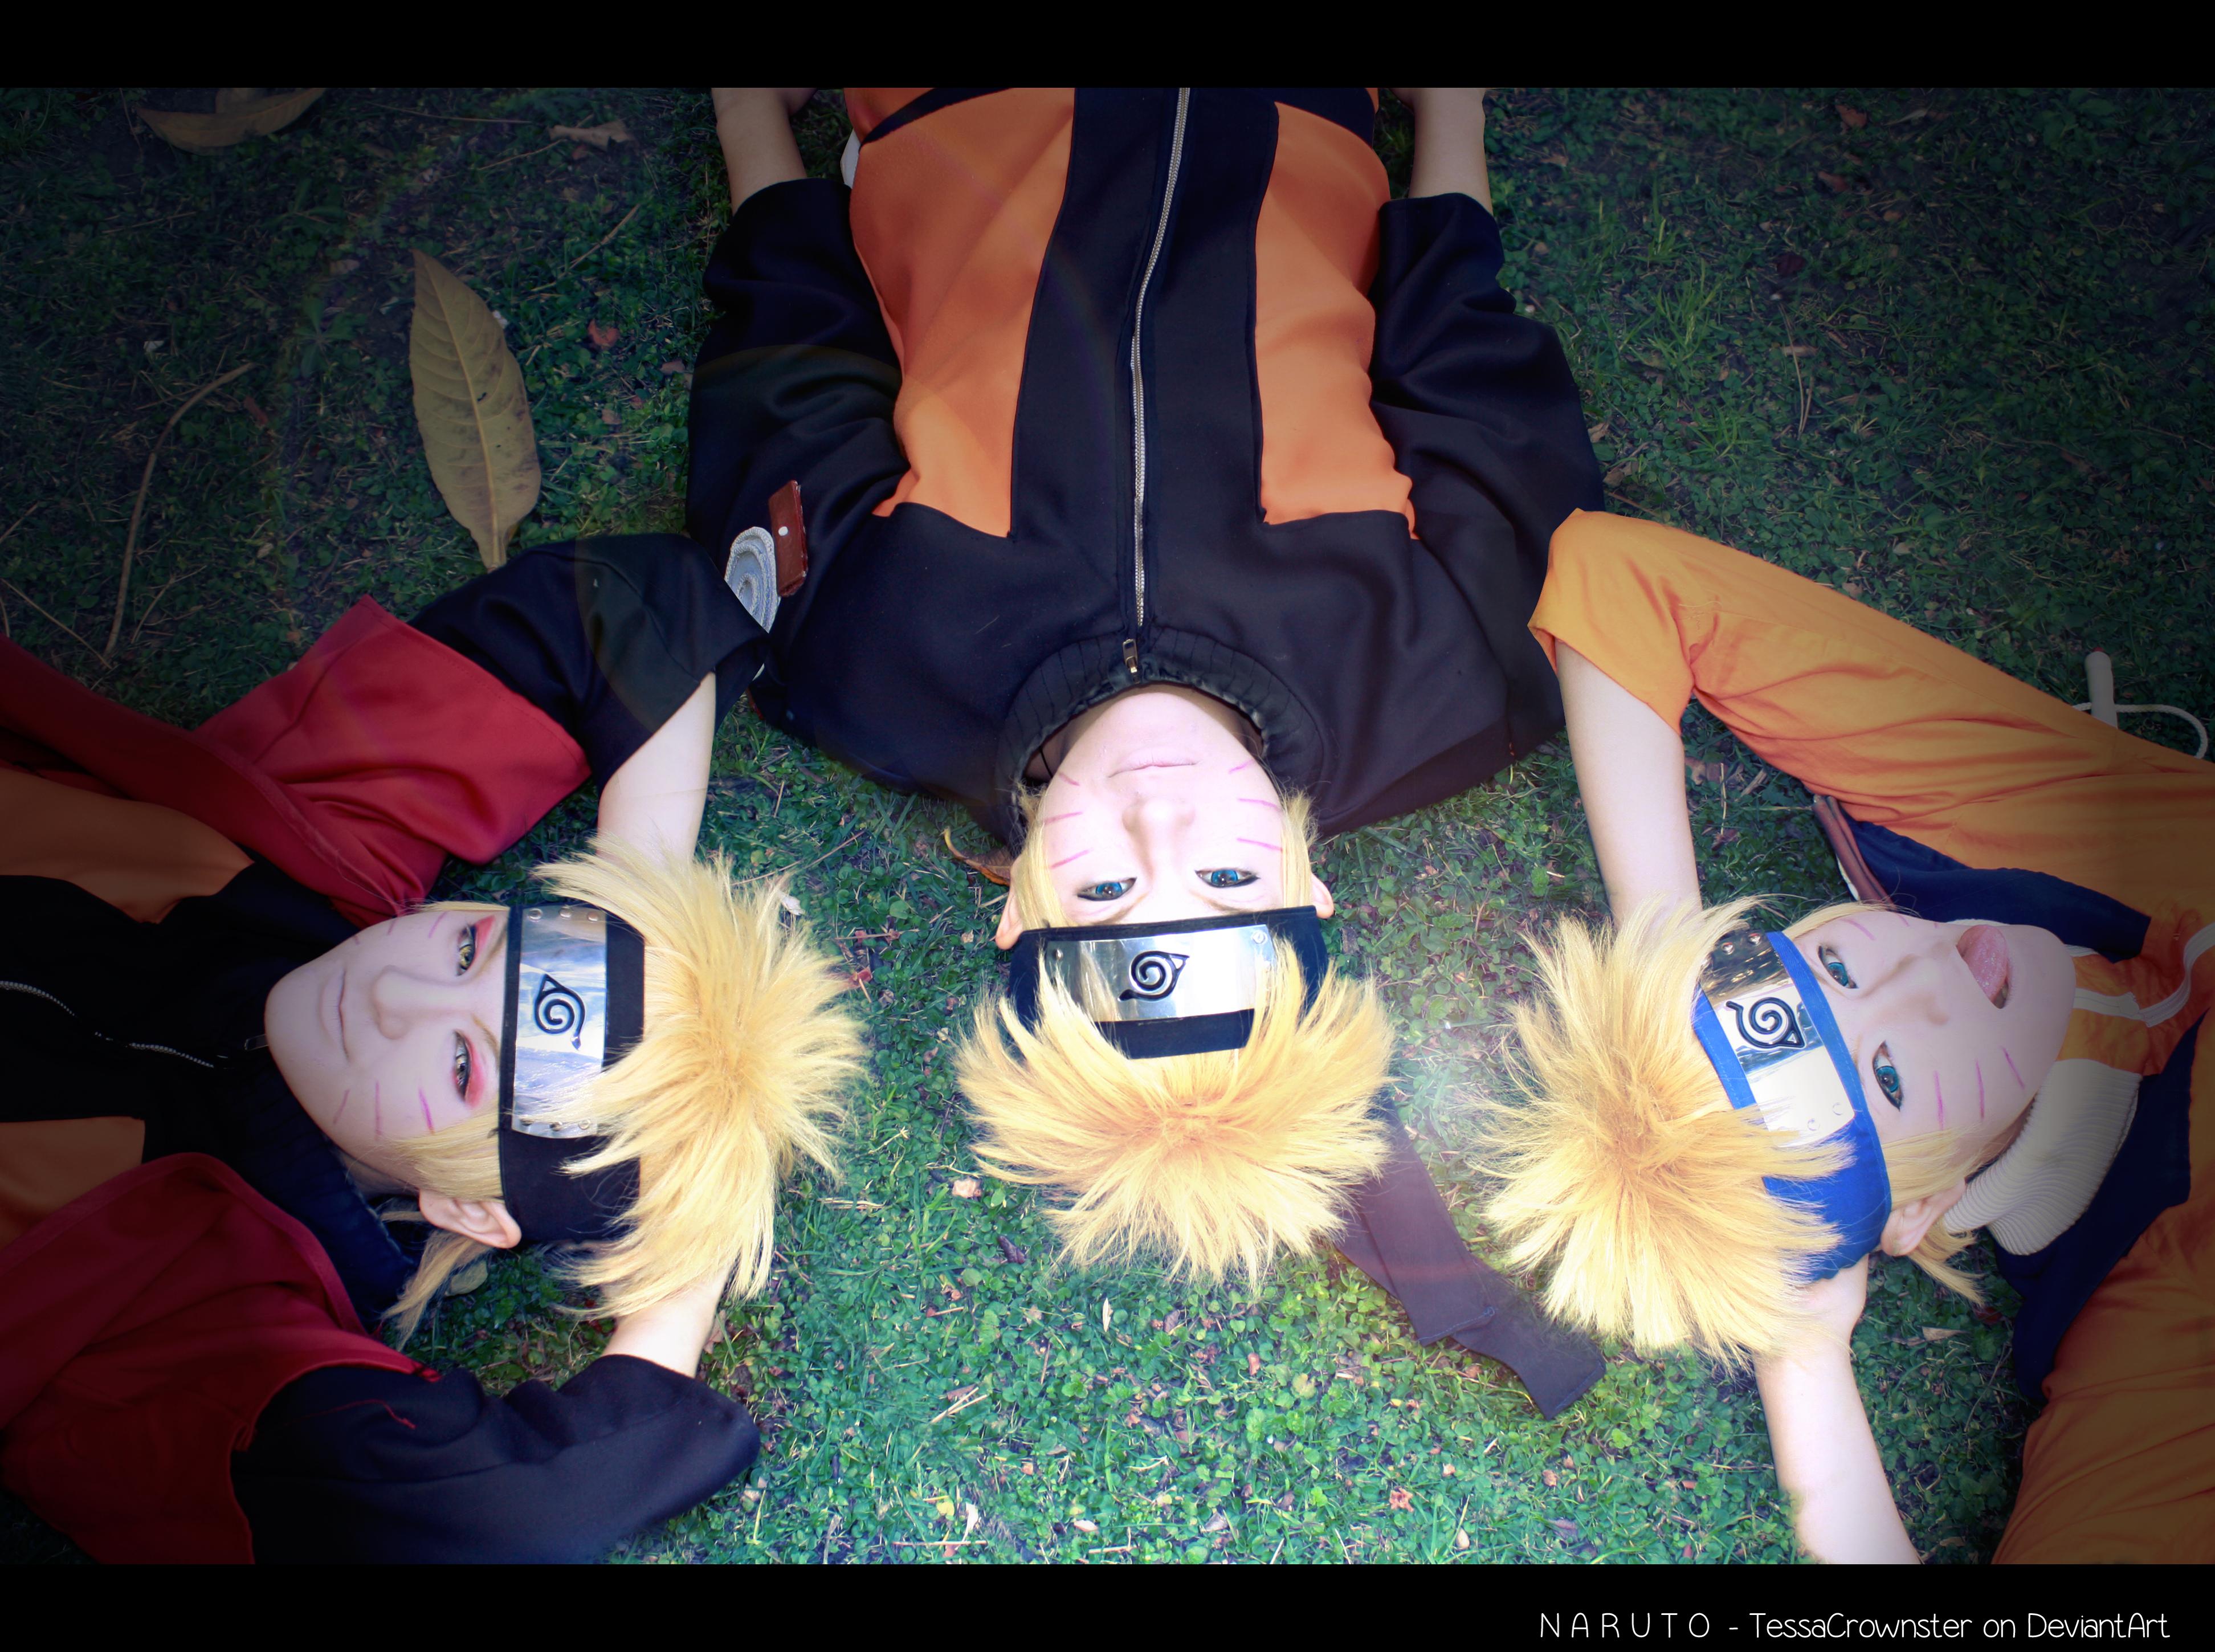 Life of a Ninja - NARUTO Cosplay by TessaCrownster